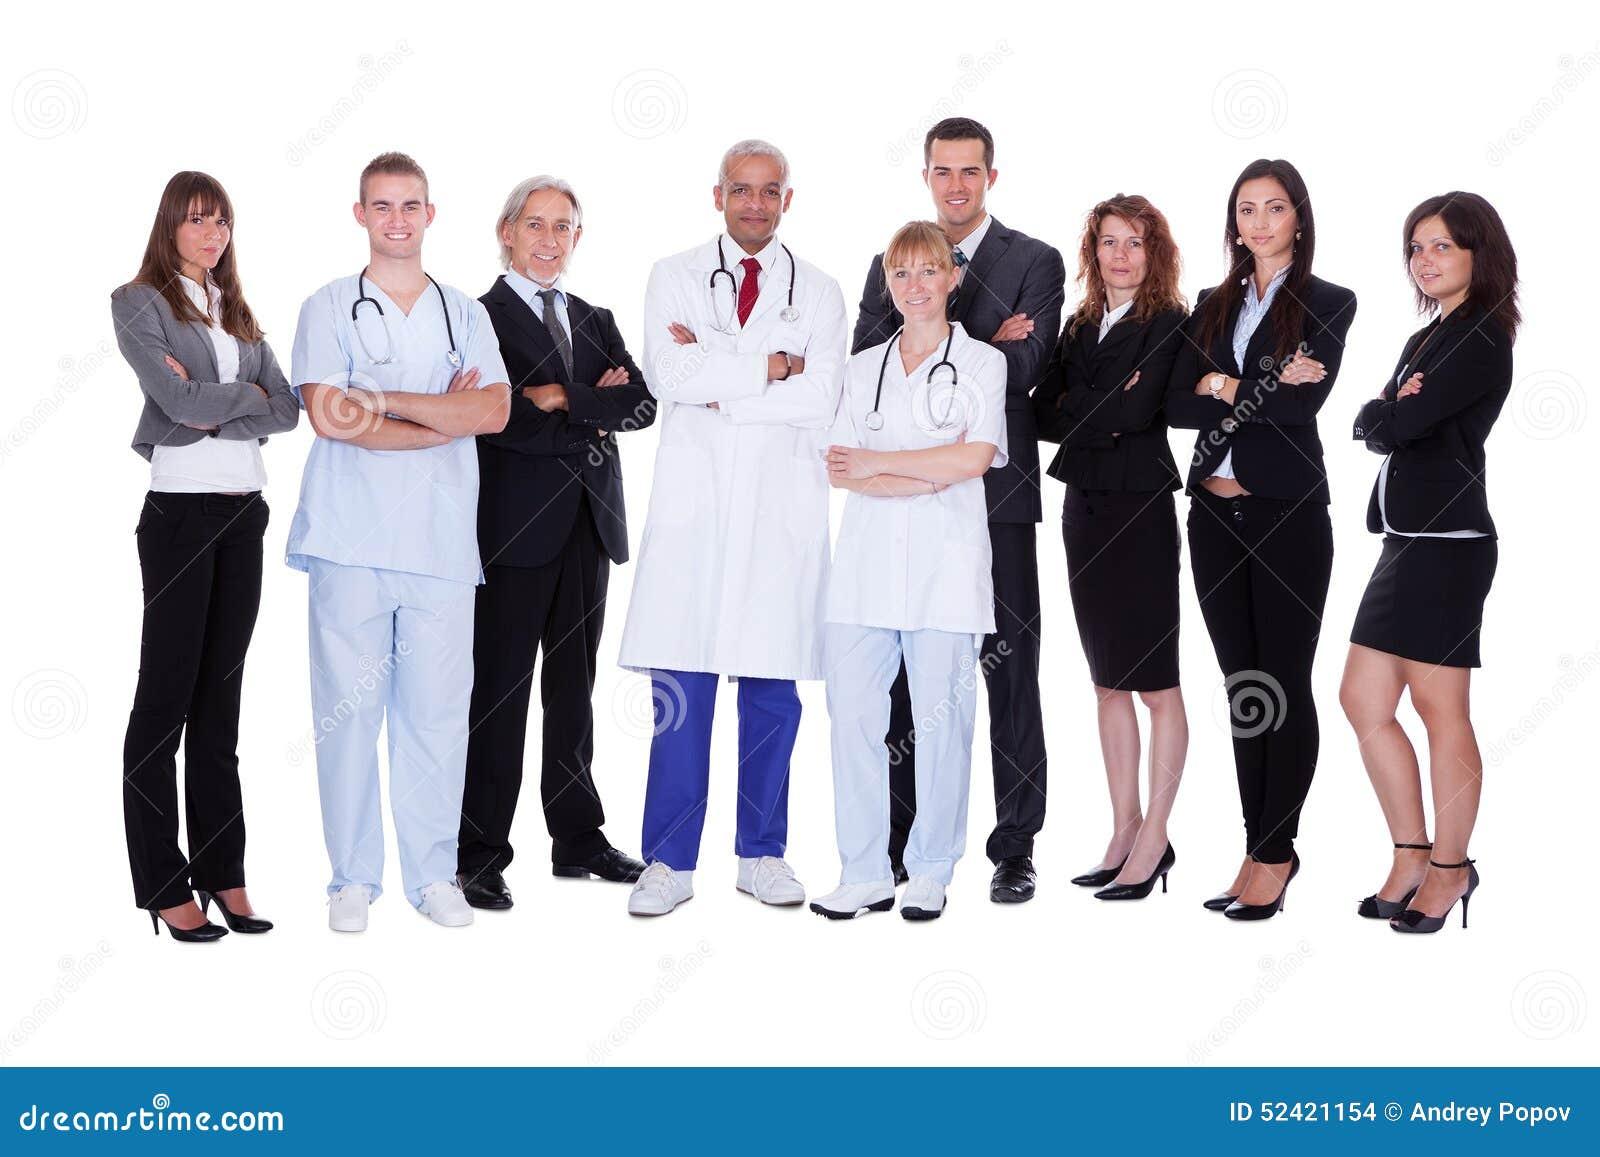 Staff Group Photo 29